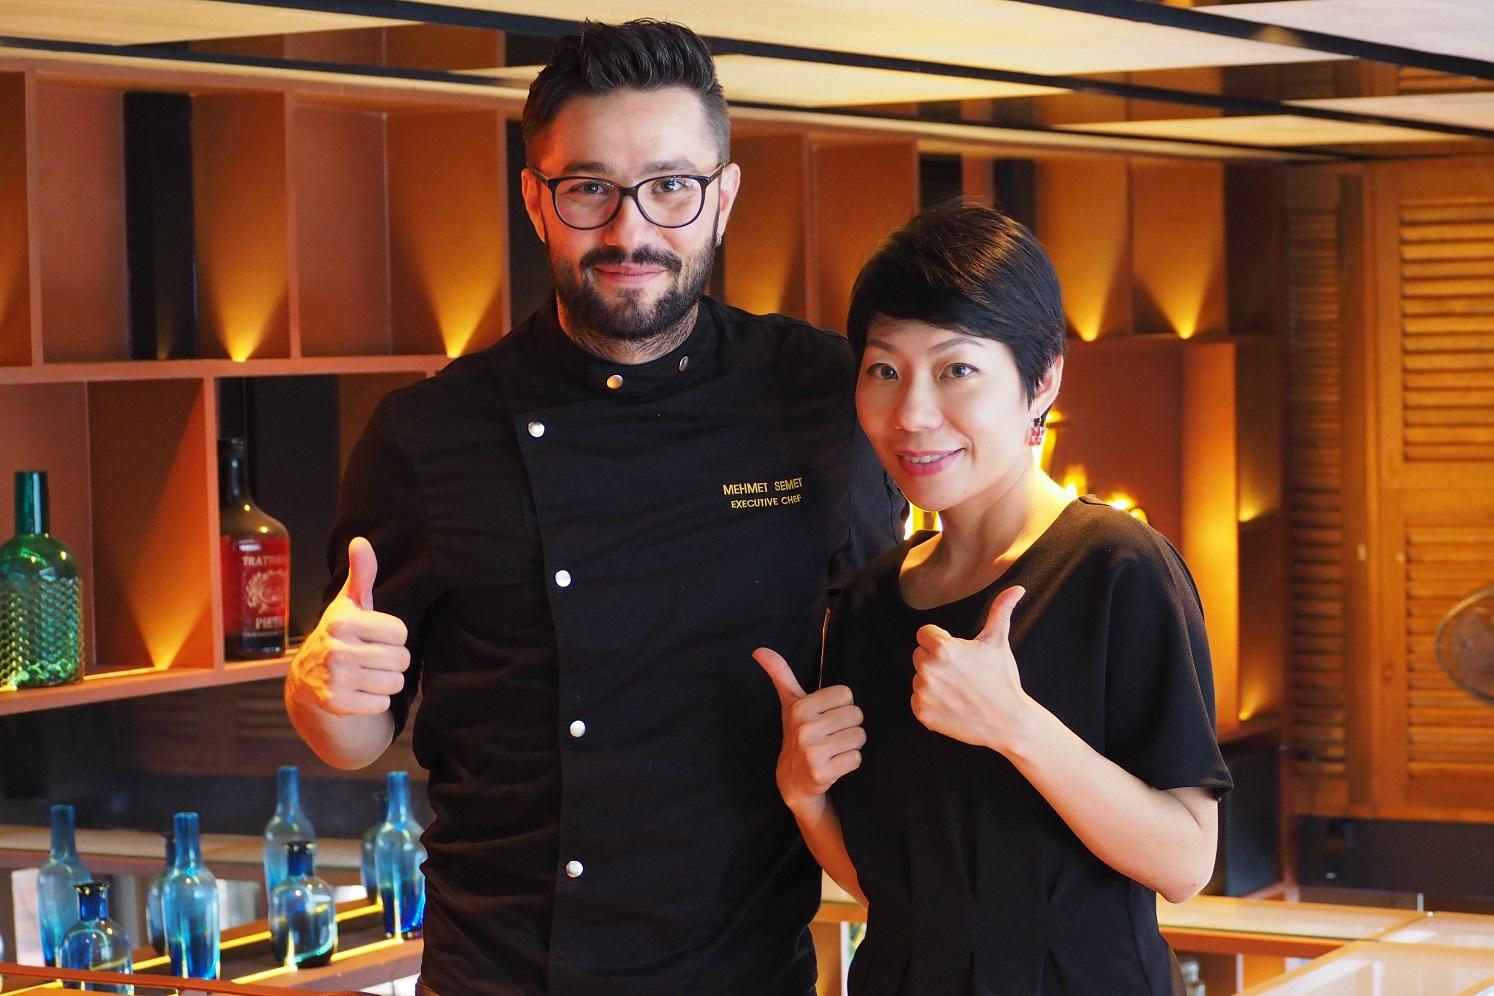 Executive Chef Mehmet Semet Invite Bangkok